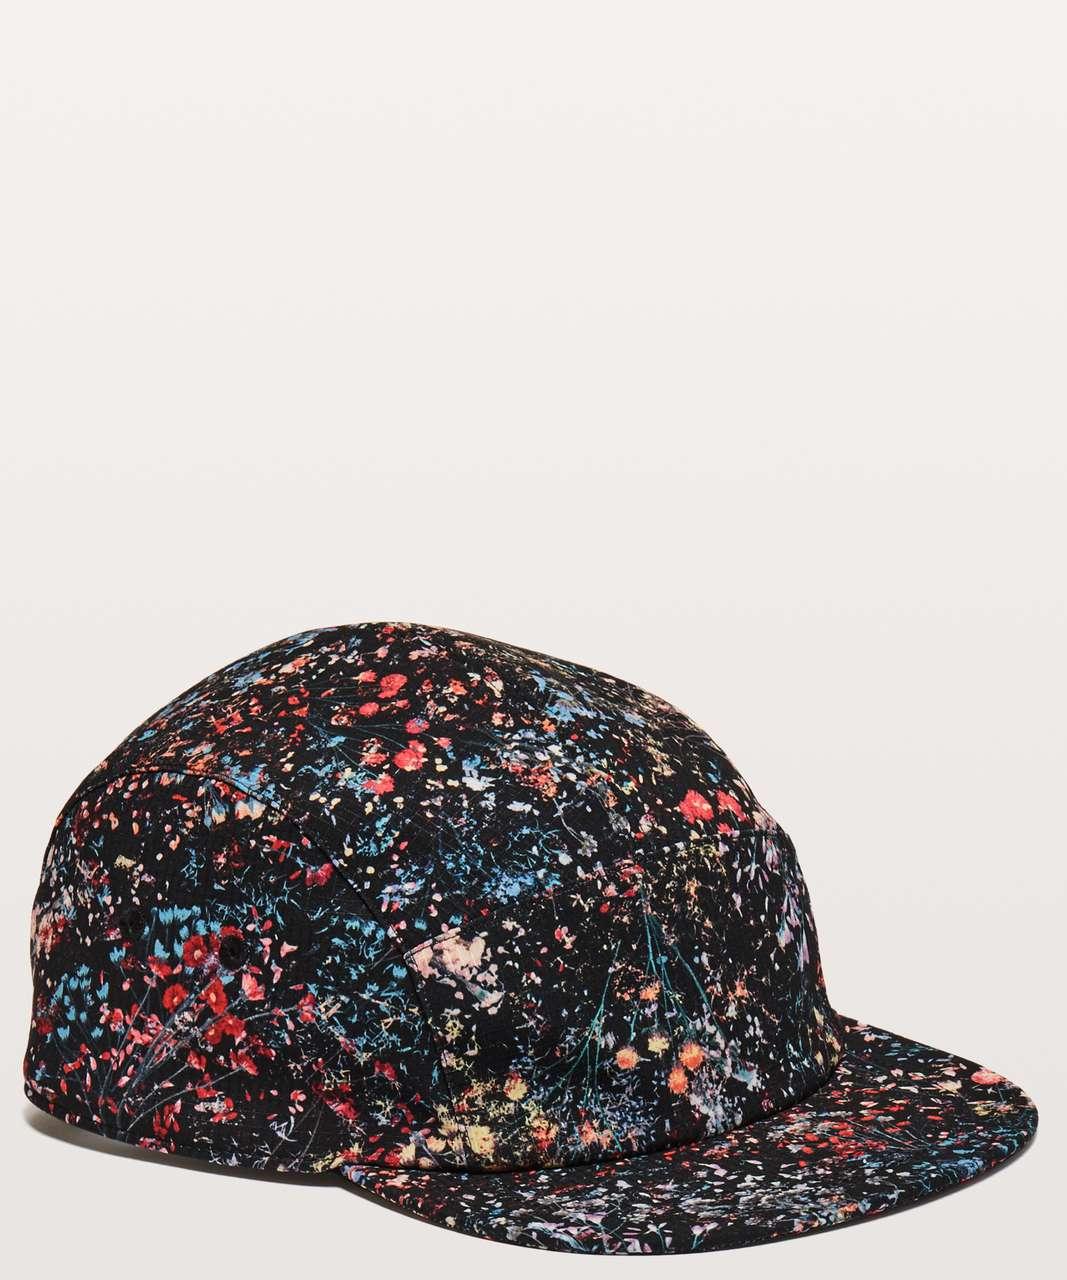 55829813 Lululemon Five Times Hat - Flowerescent Multi - lulu fanatics